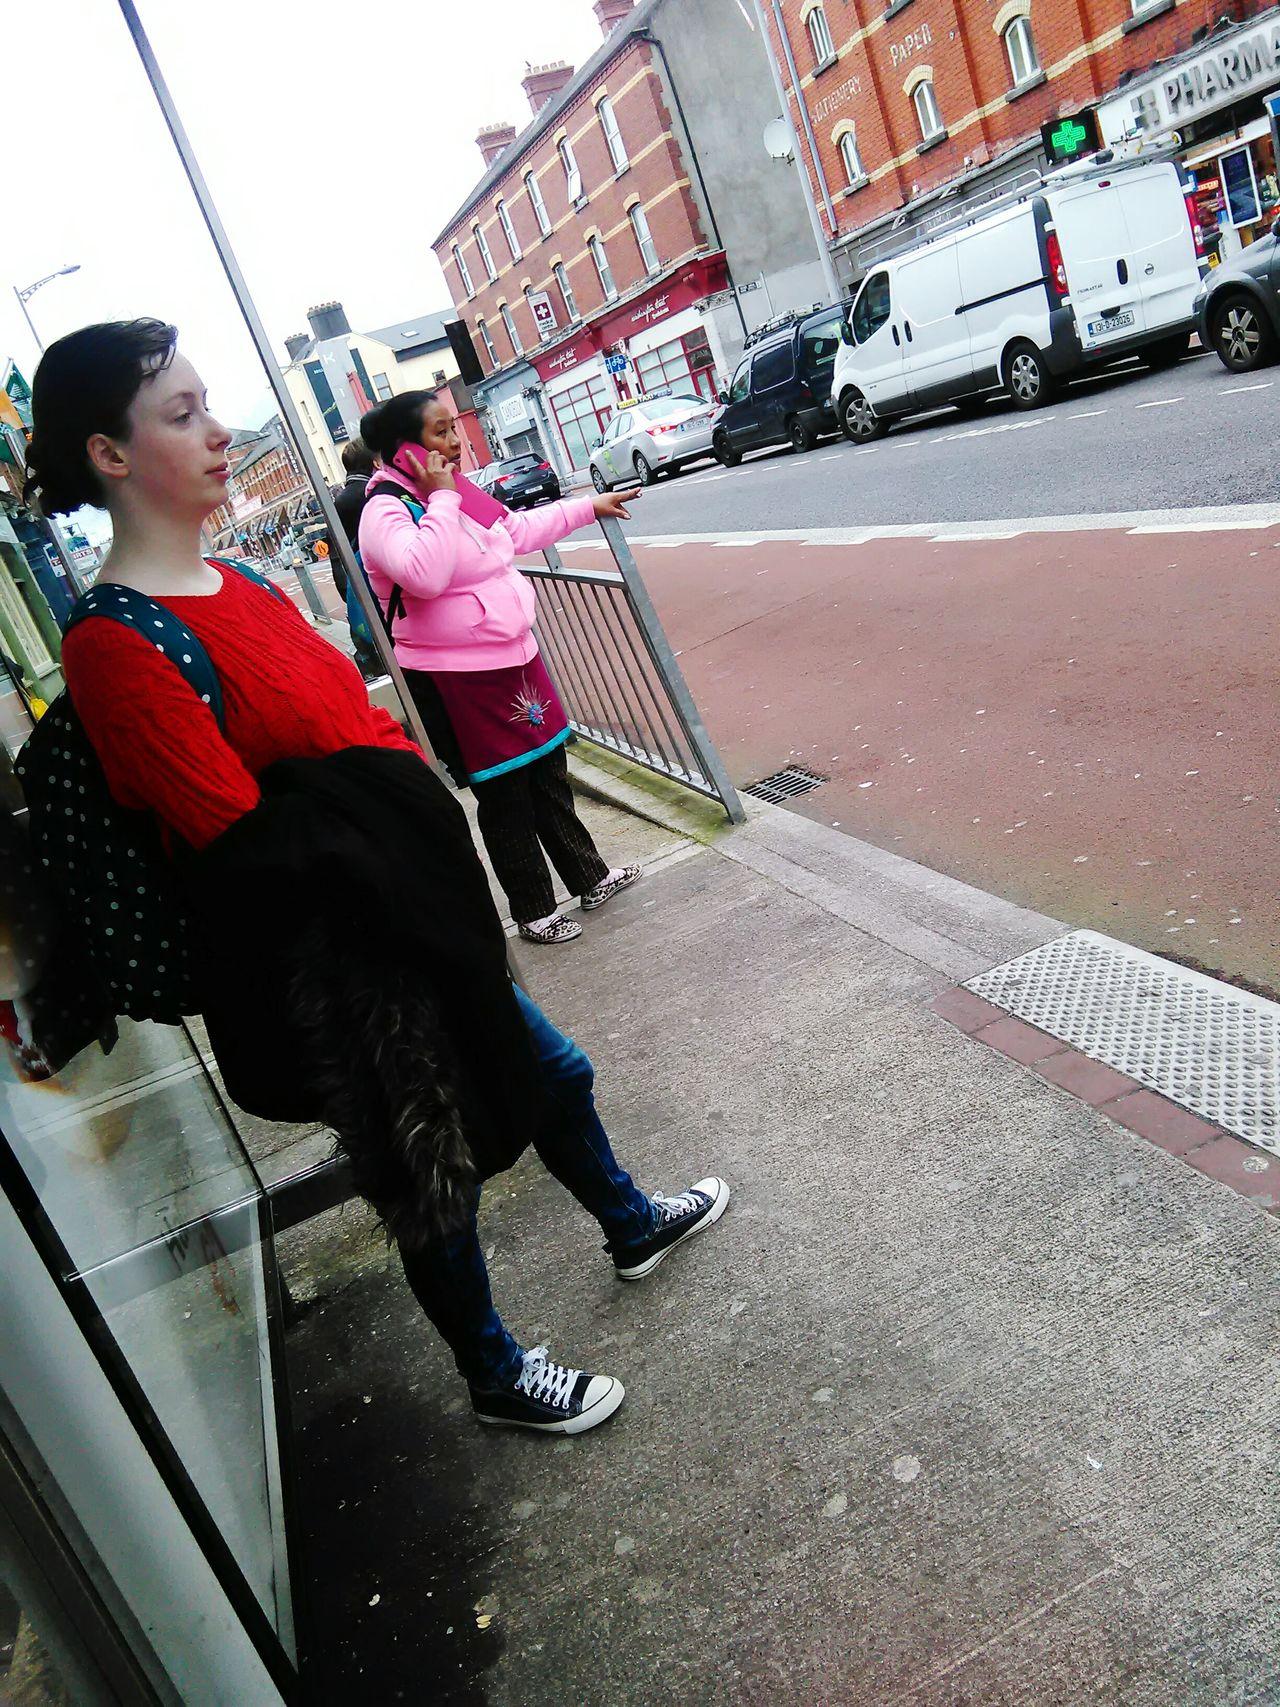 Random People Randomclicks Randomphotography Random_Pics People Watching Peoplephotography in Cork City Ireland🍀